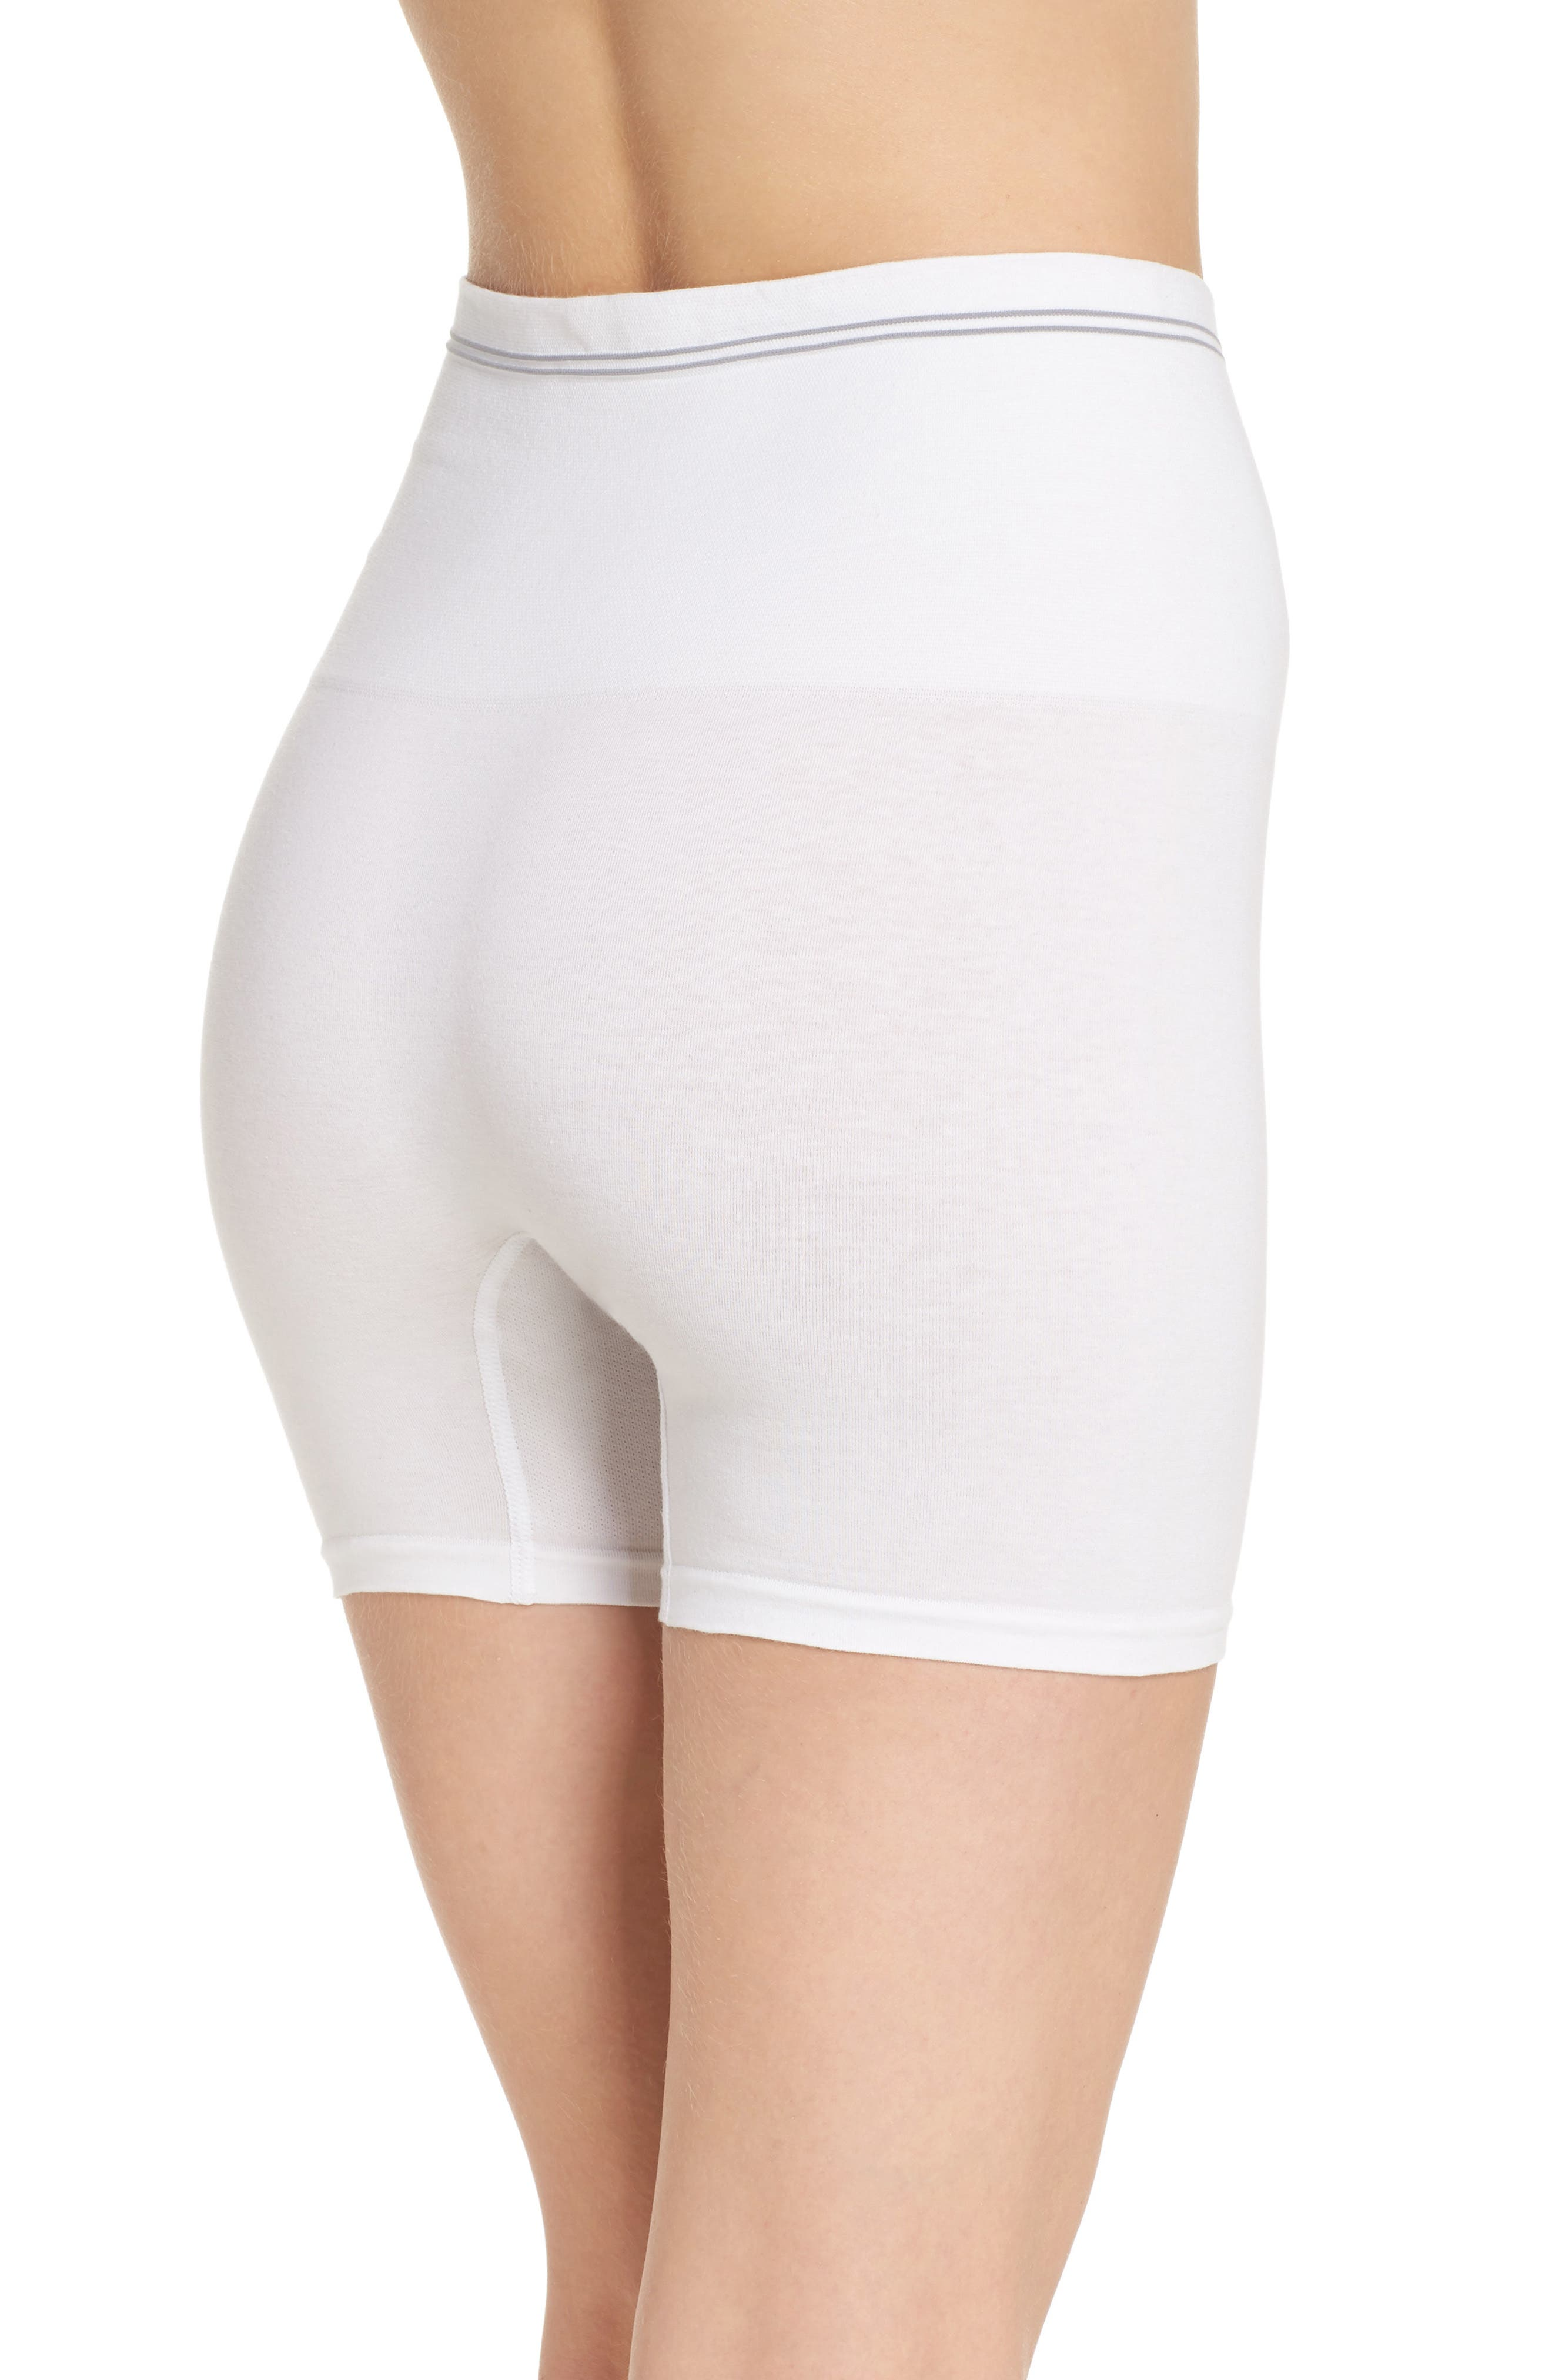 Seamless Shaping Shorts,                             Alternate thumbnail 2, color,                             White